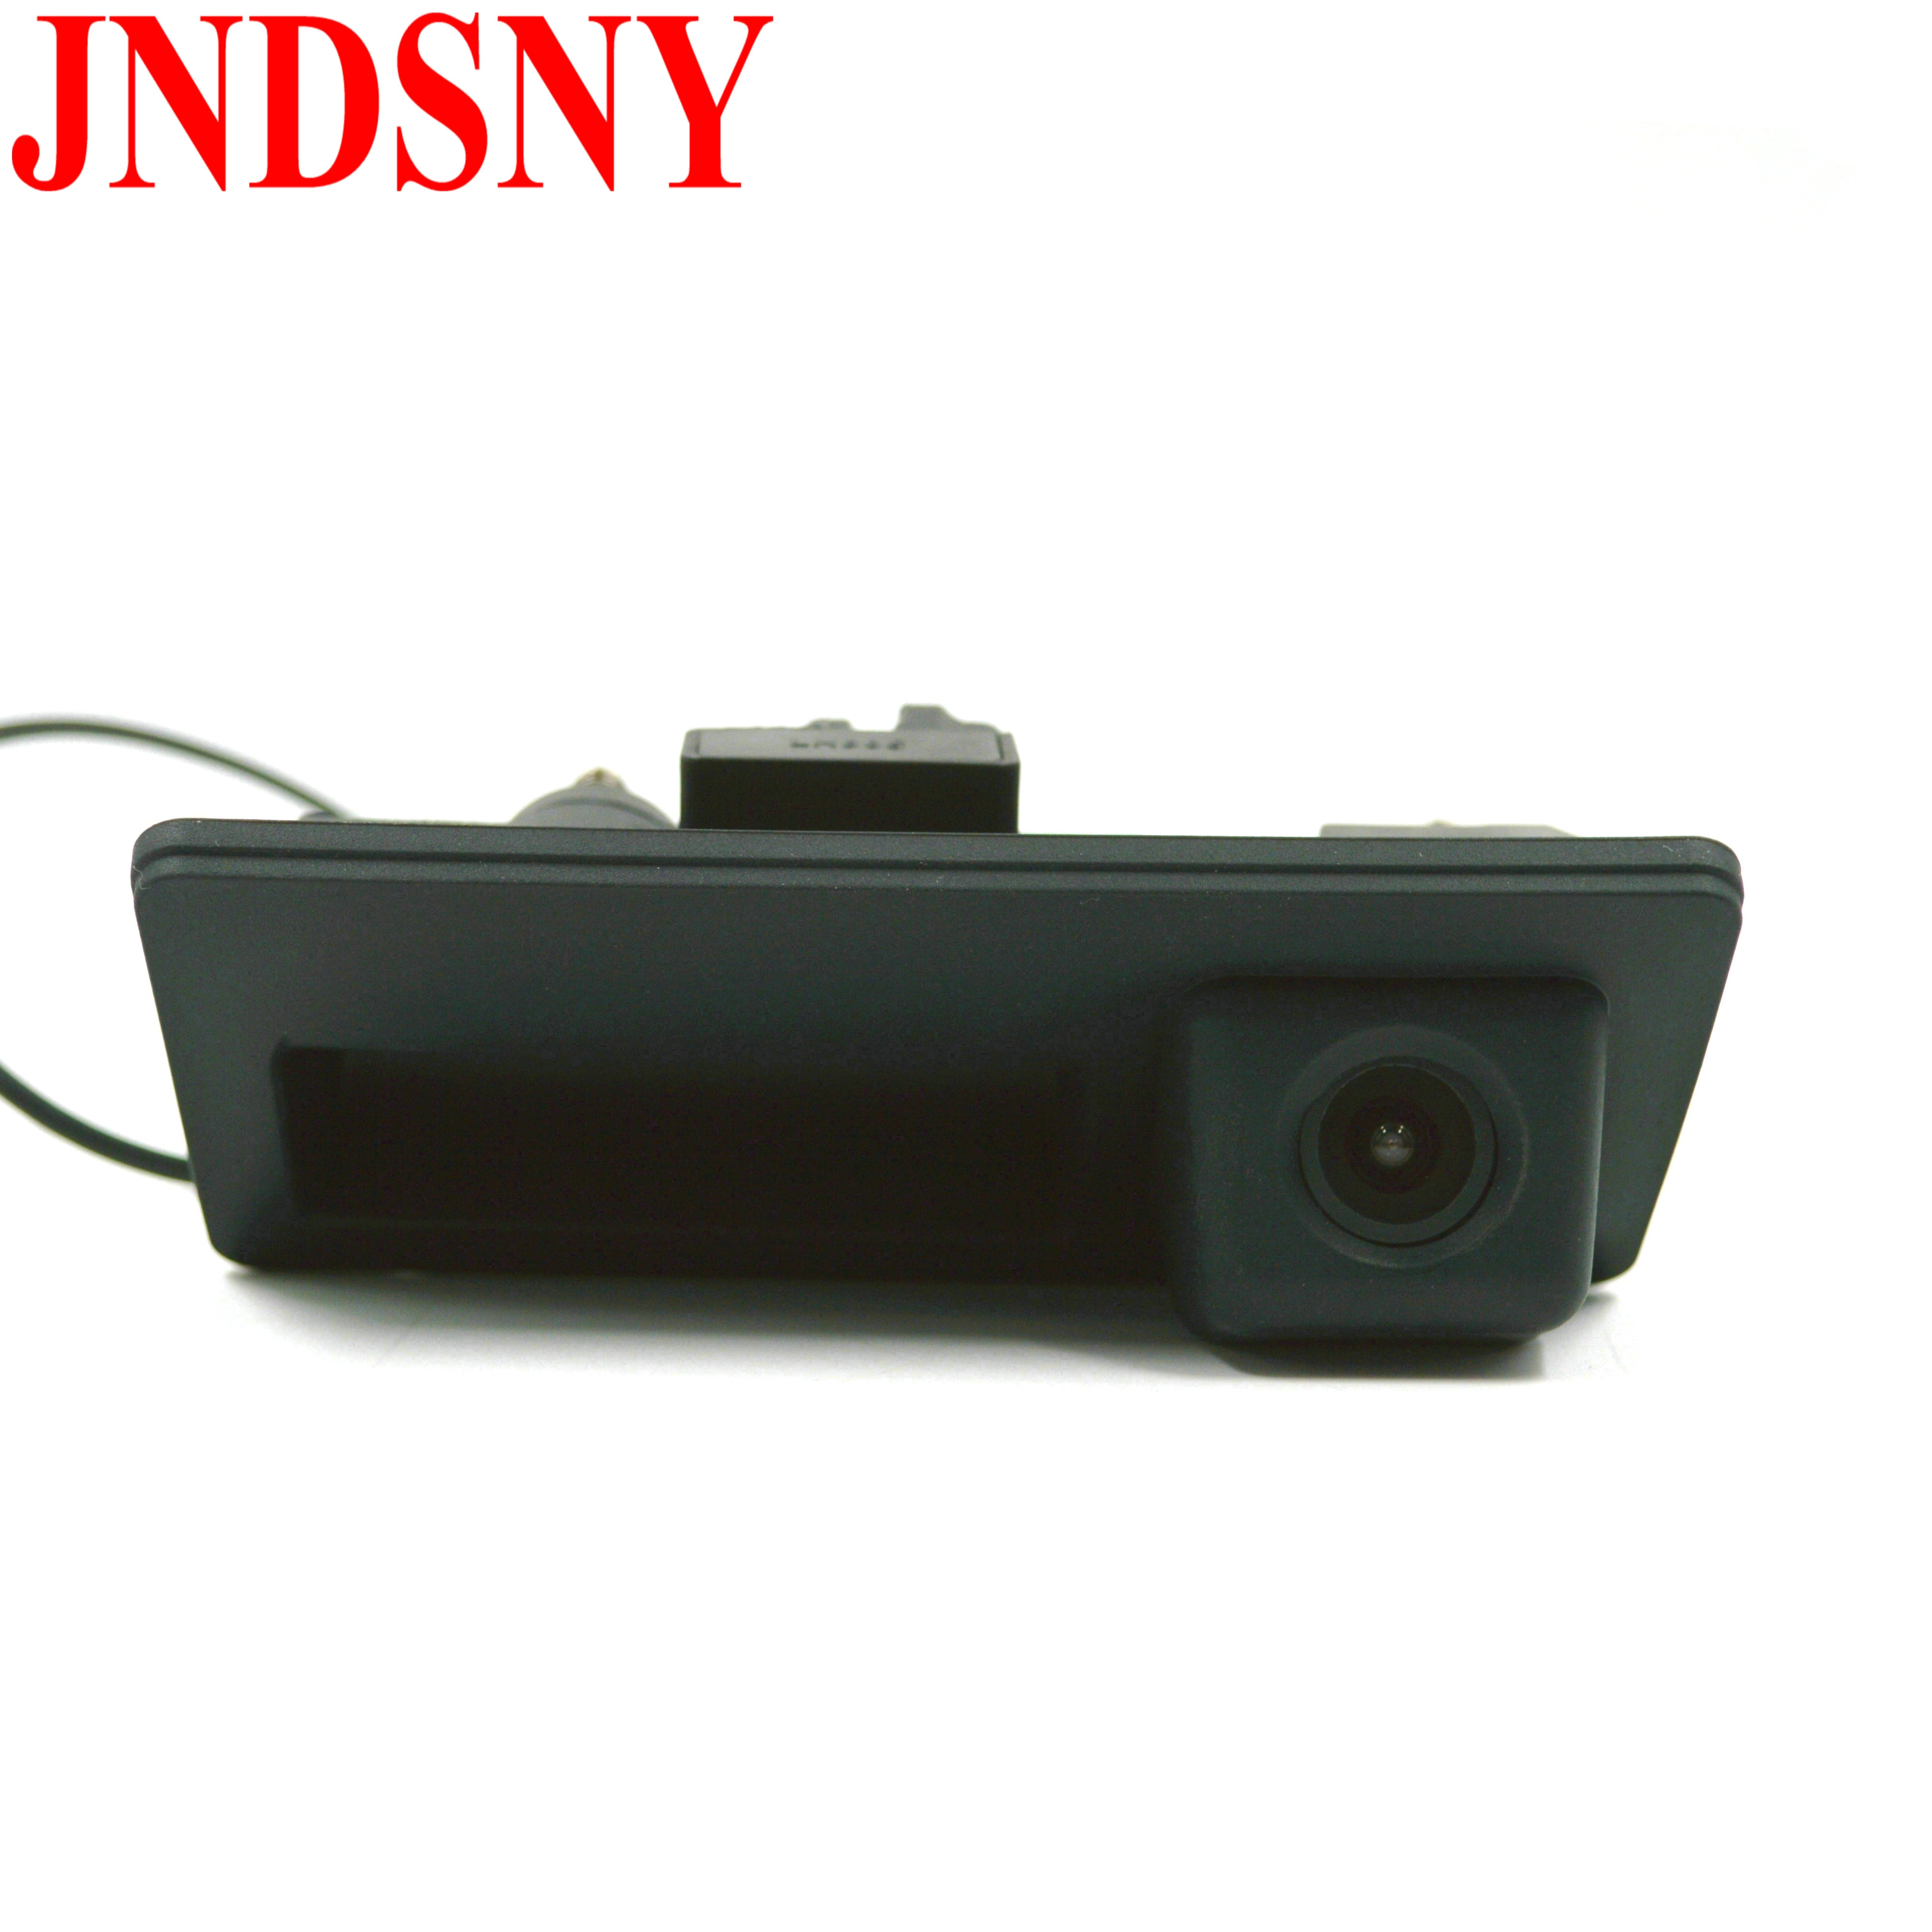 JNDSNY RCD330 más RCD360 AV maletero con cámara trasera para VW Passat B6 B7 /Tiguan /Golf 5 5 5 6 6 7 /Jetta /Touareg /Sharan